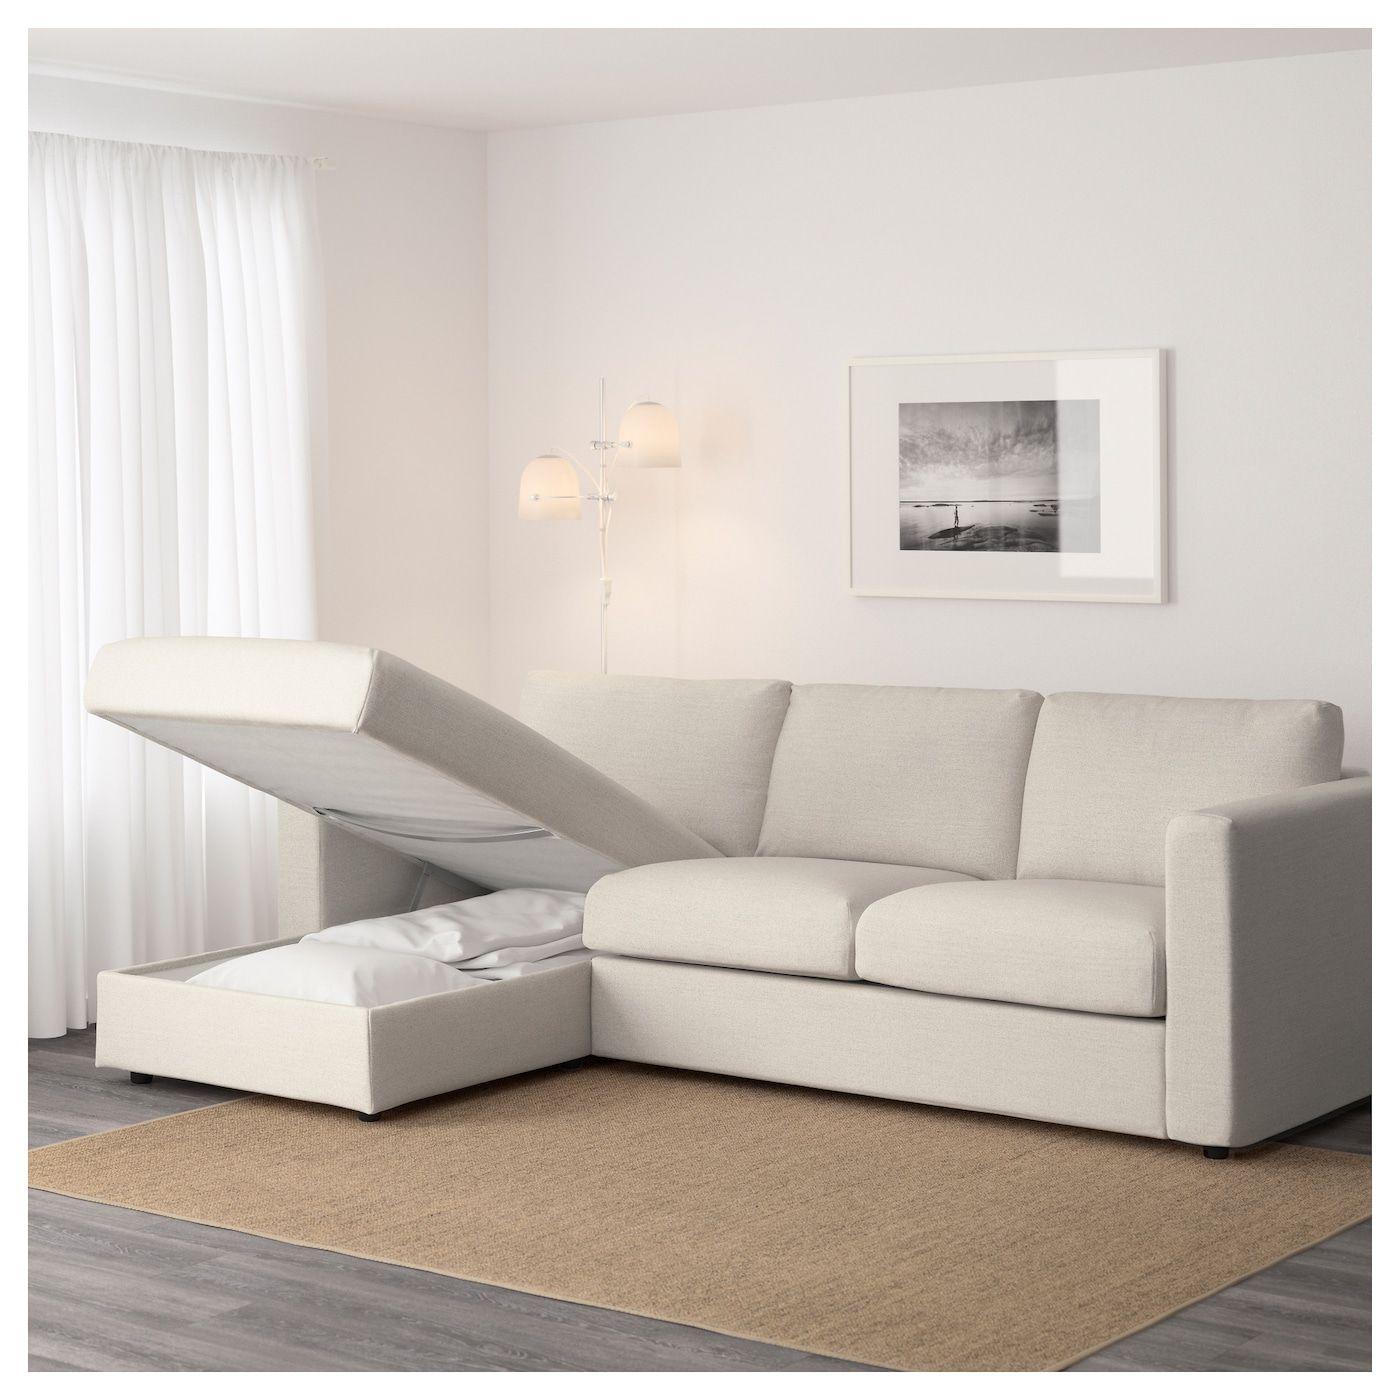 Vimle Sofa With Chaise Gunnared Beige Ikea Vimle Sofa Cozy